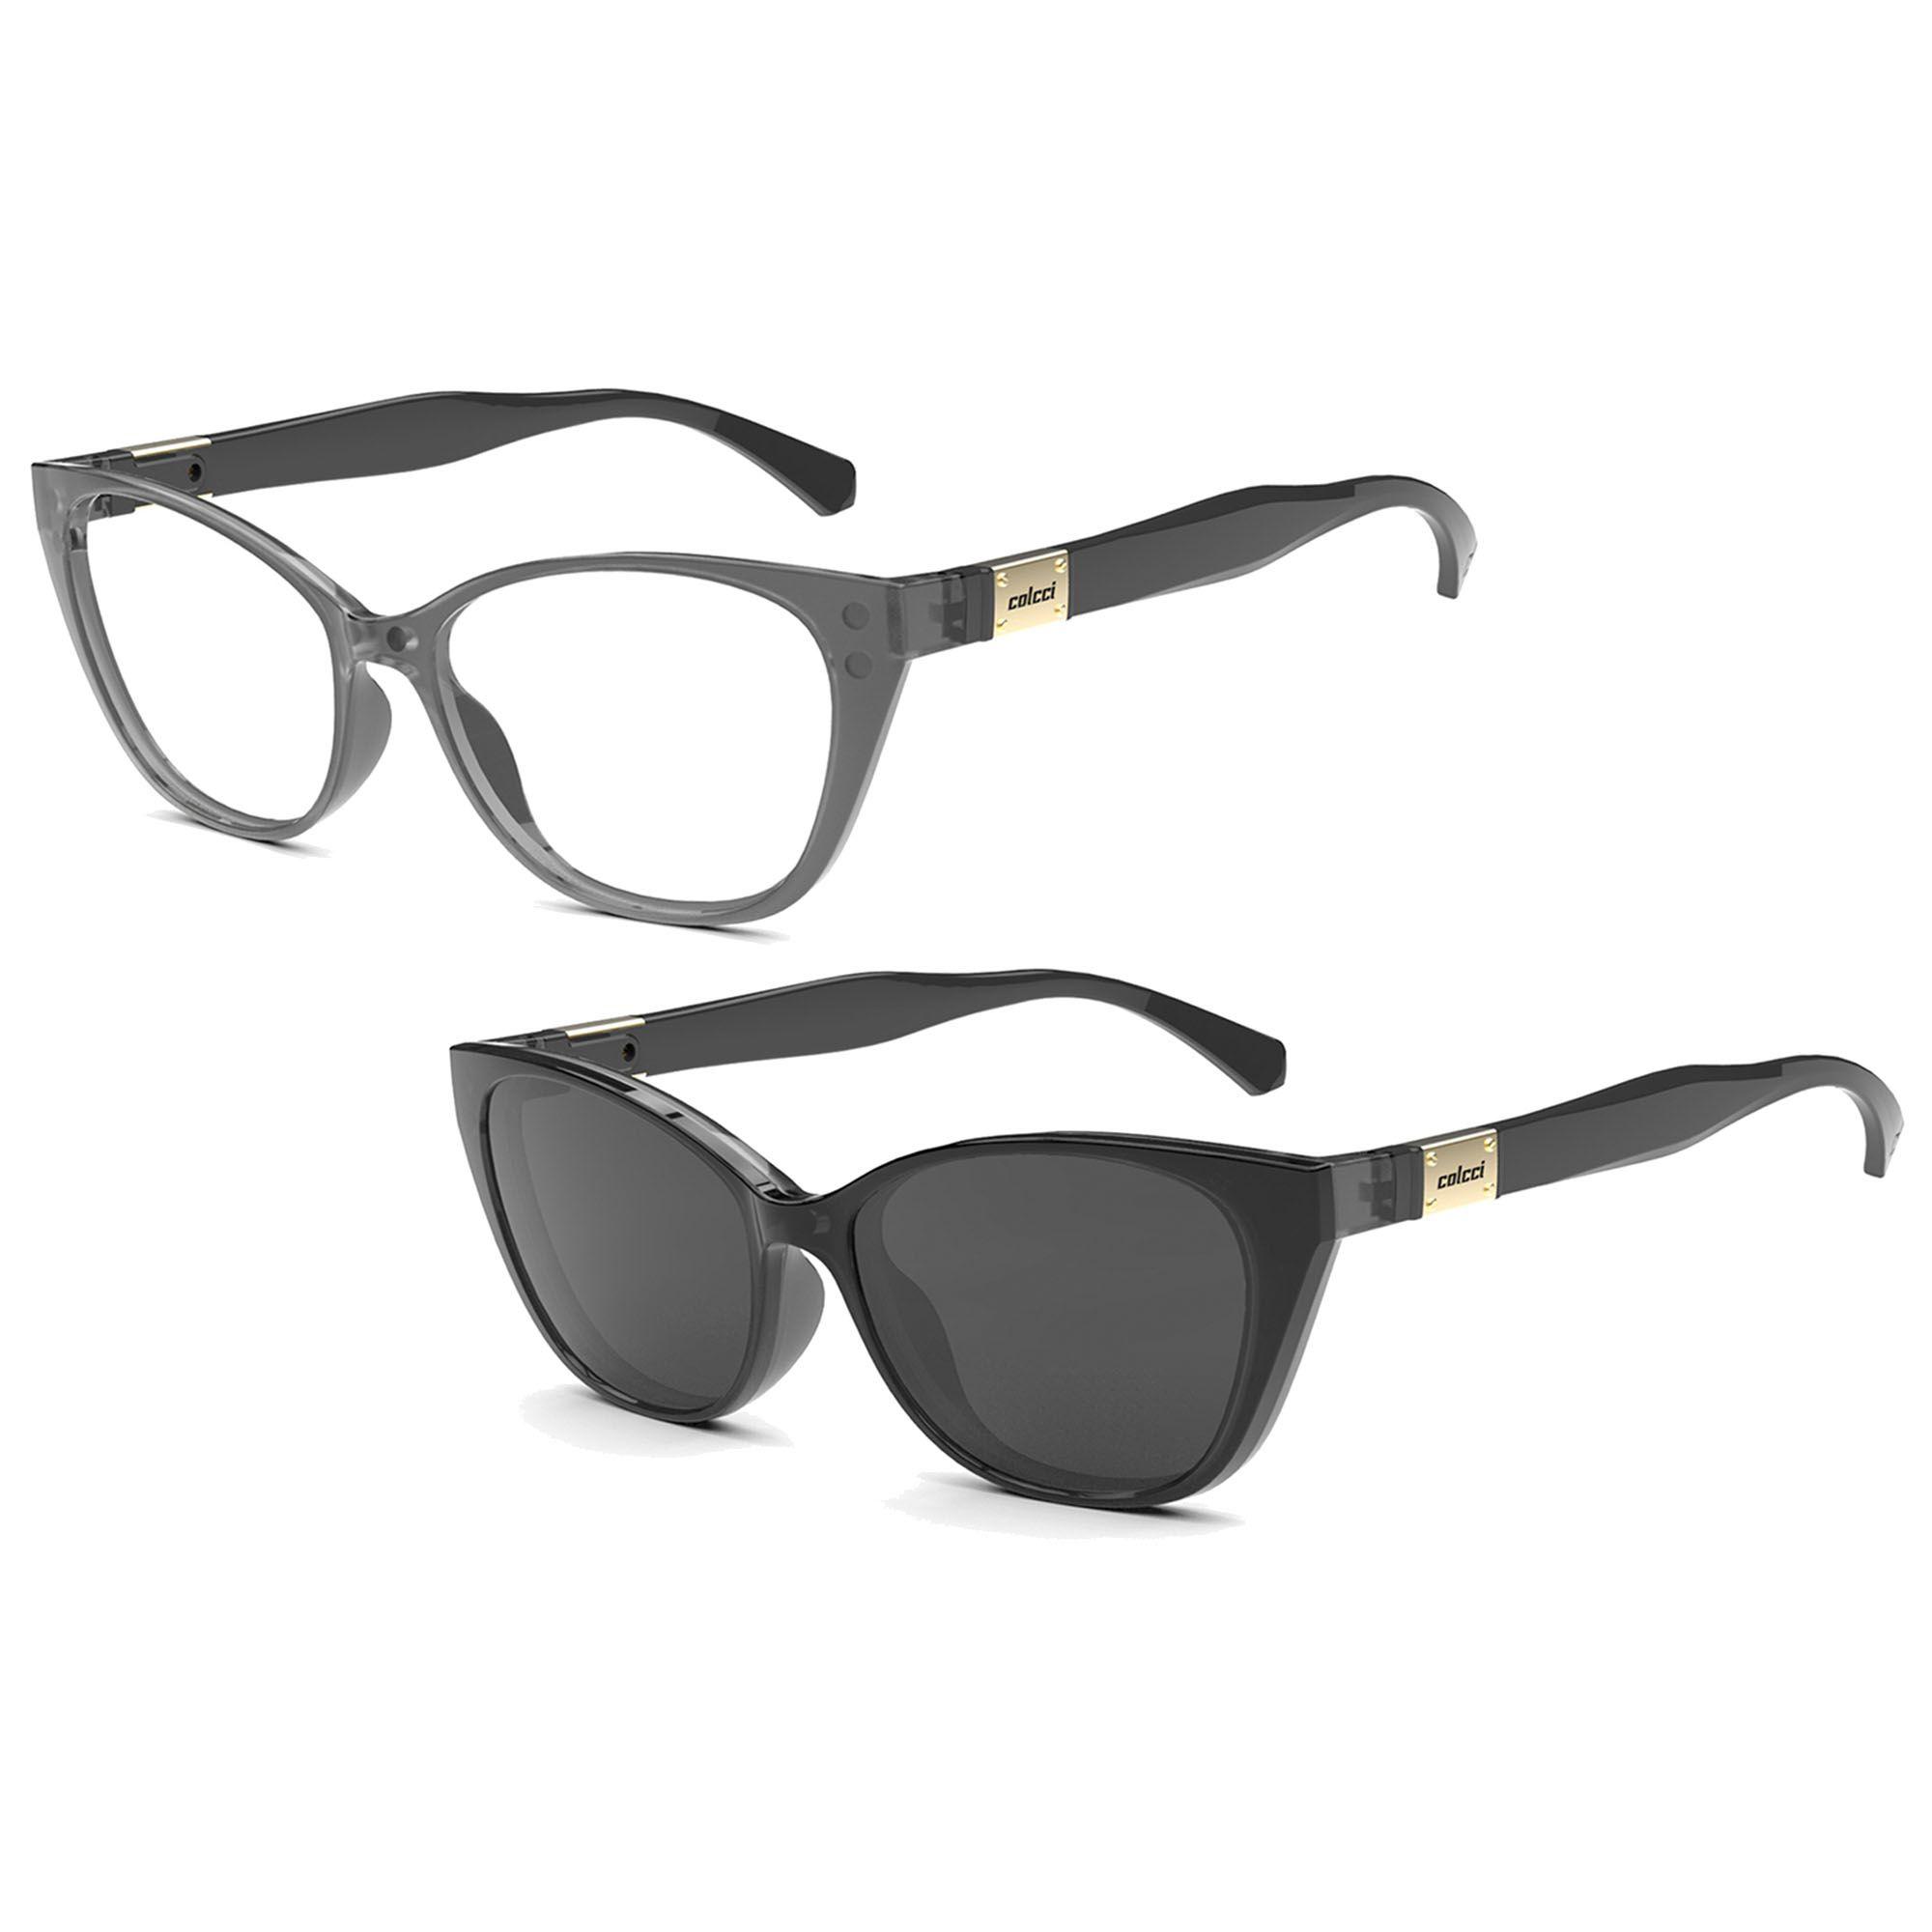 Óculos de Grau Feminino Colcci Bandy I C6122DG552 Clip On Solar Polarizado